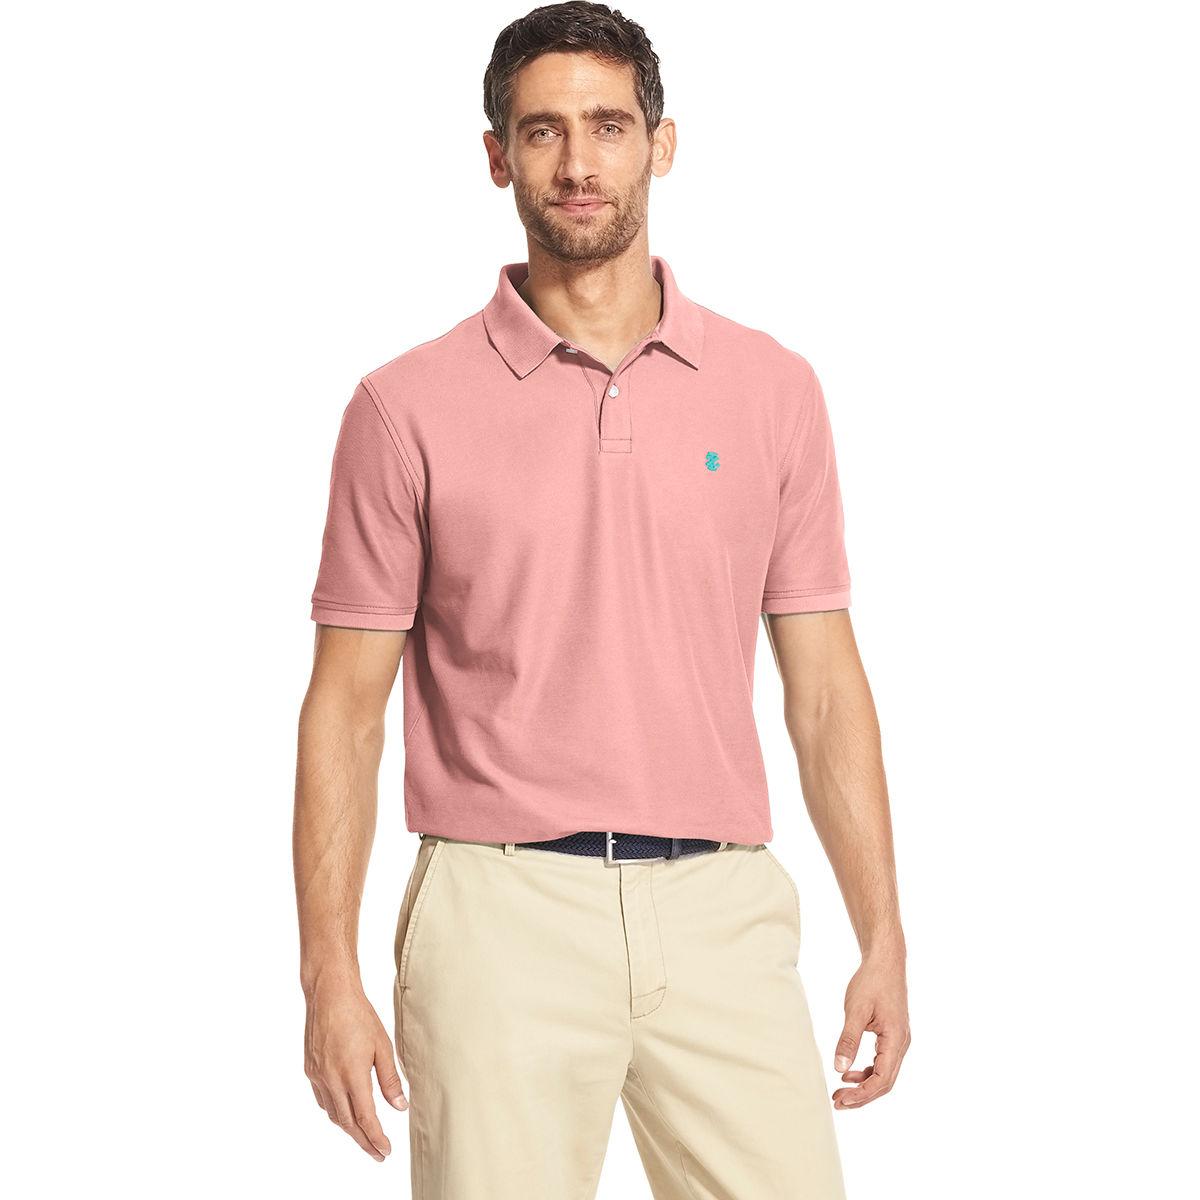 Izod Men's Advantage Short-Sleeve Polo Shirt - Orange, XL